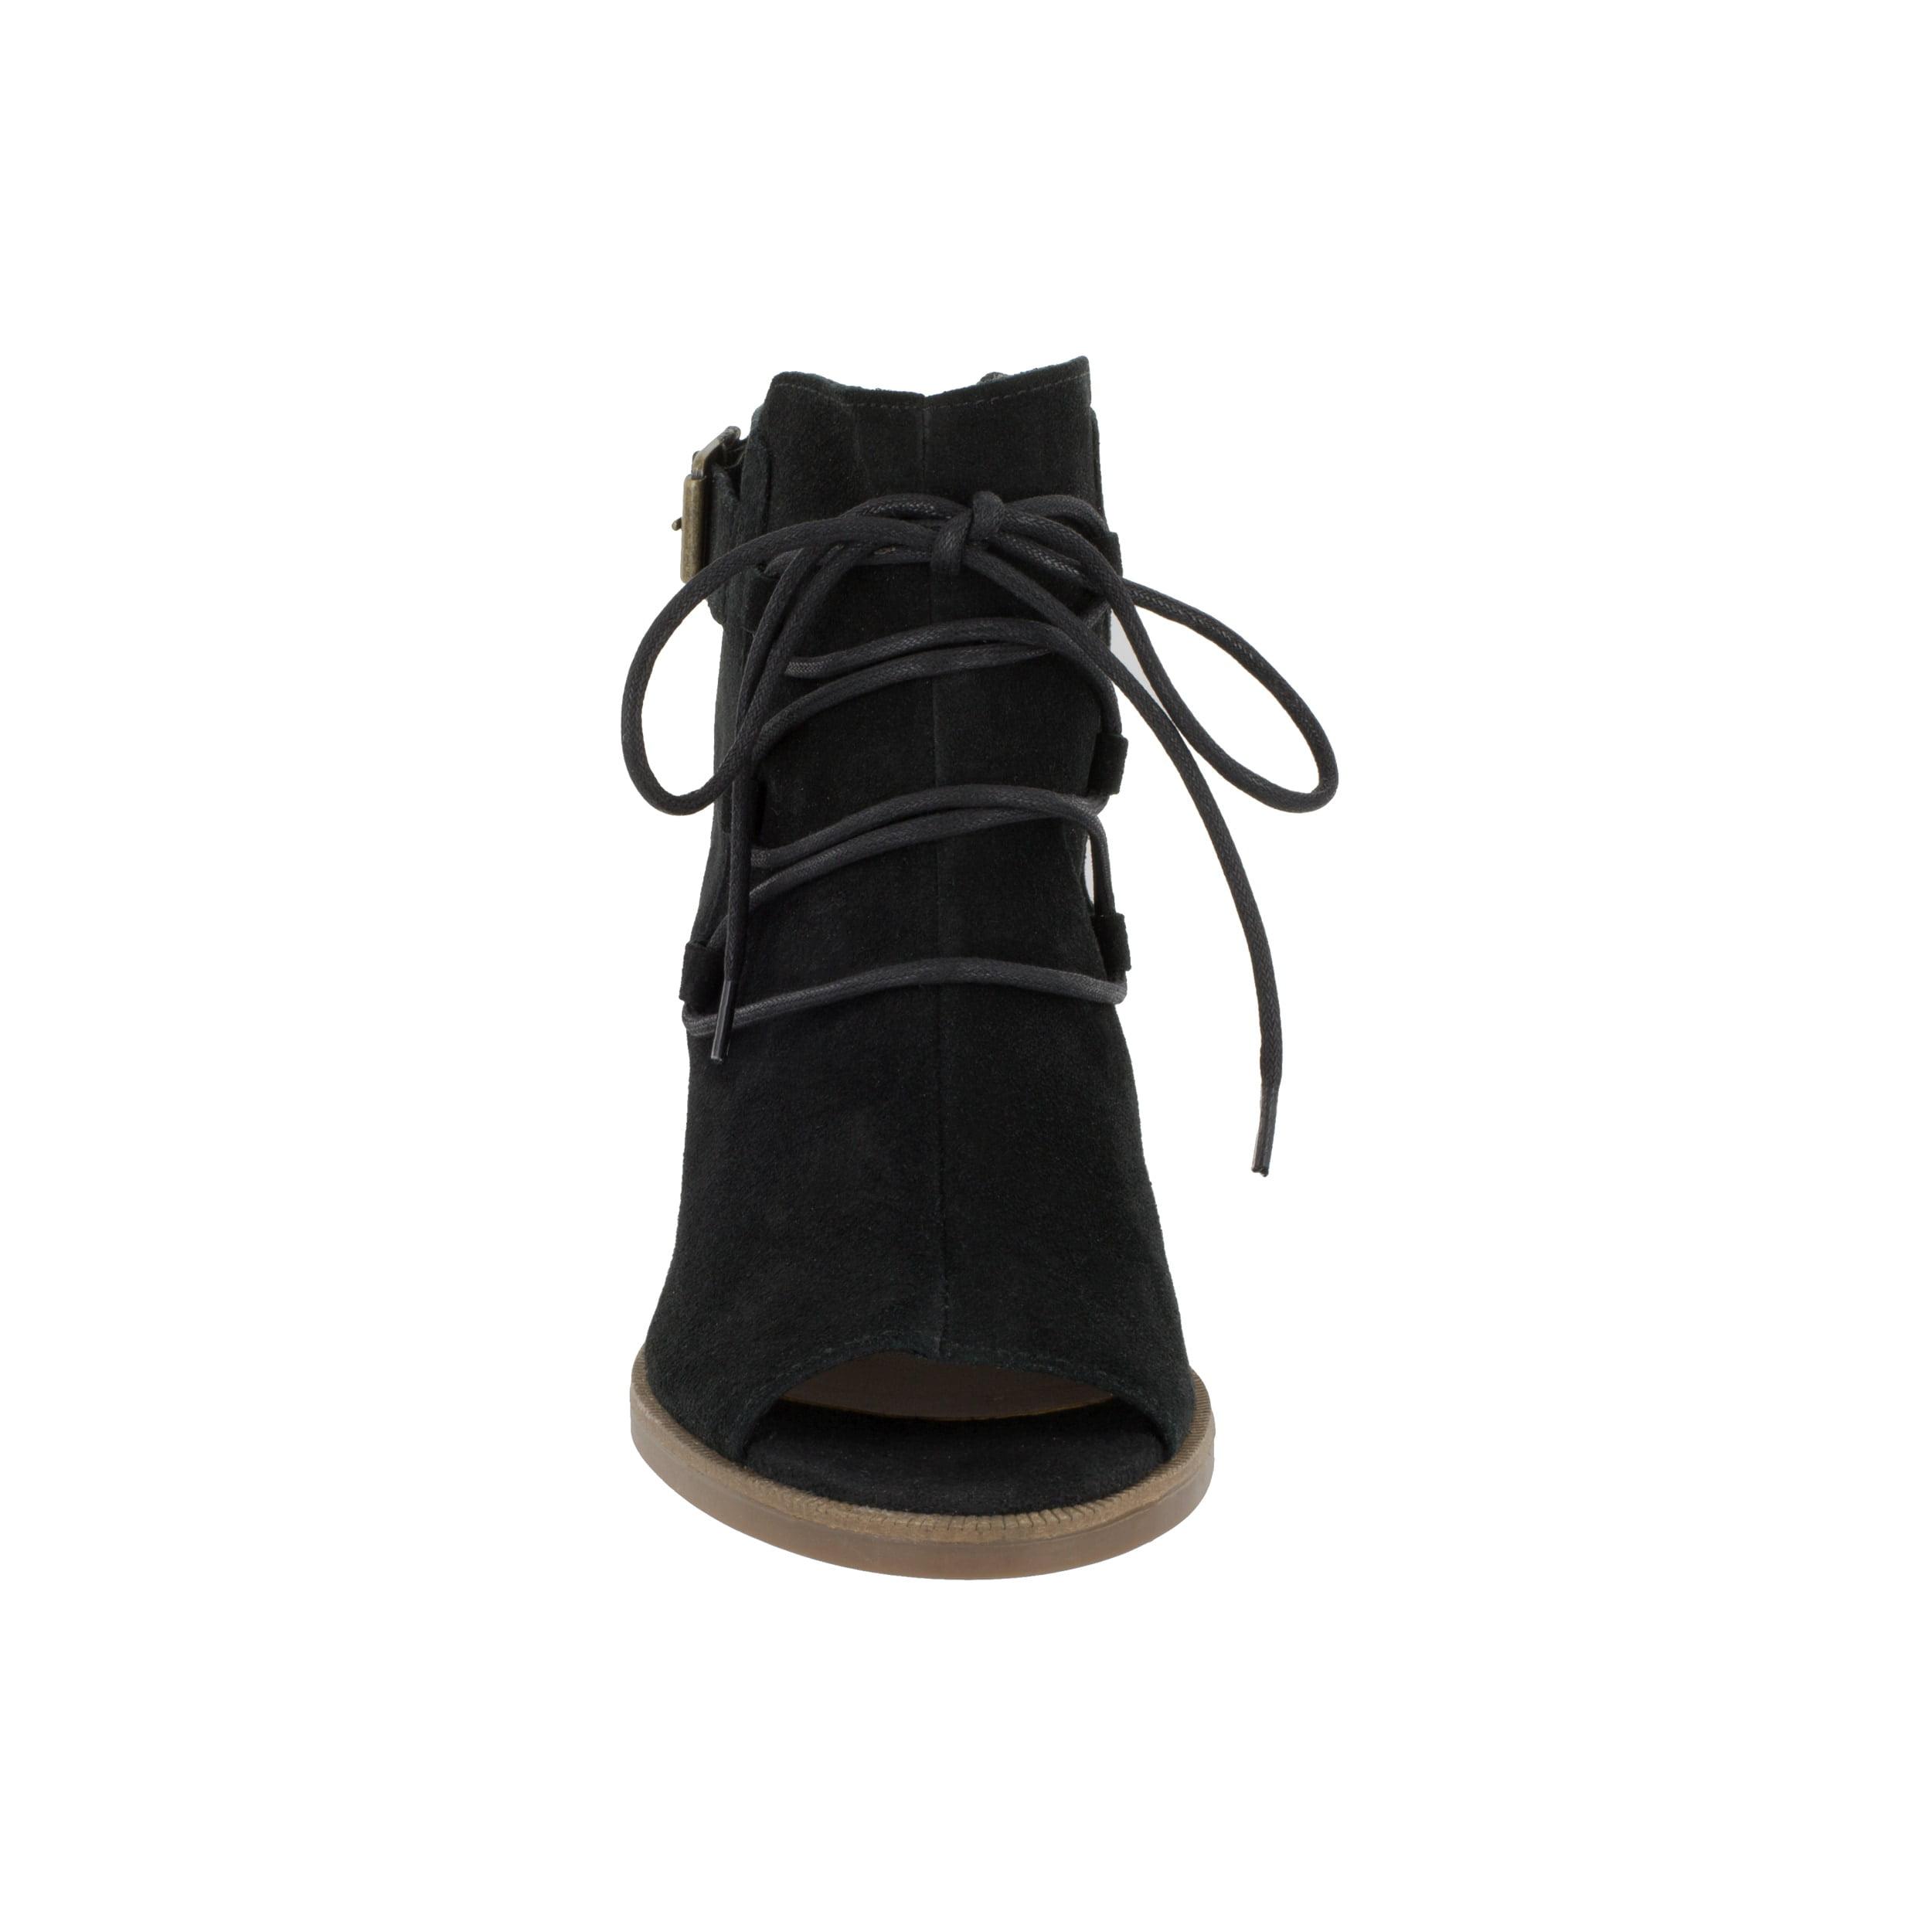 Bella Vita Women's Pru-Italy Black Italian Suede Shoes by Overstock